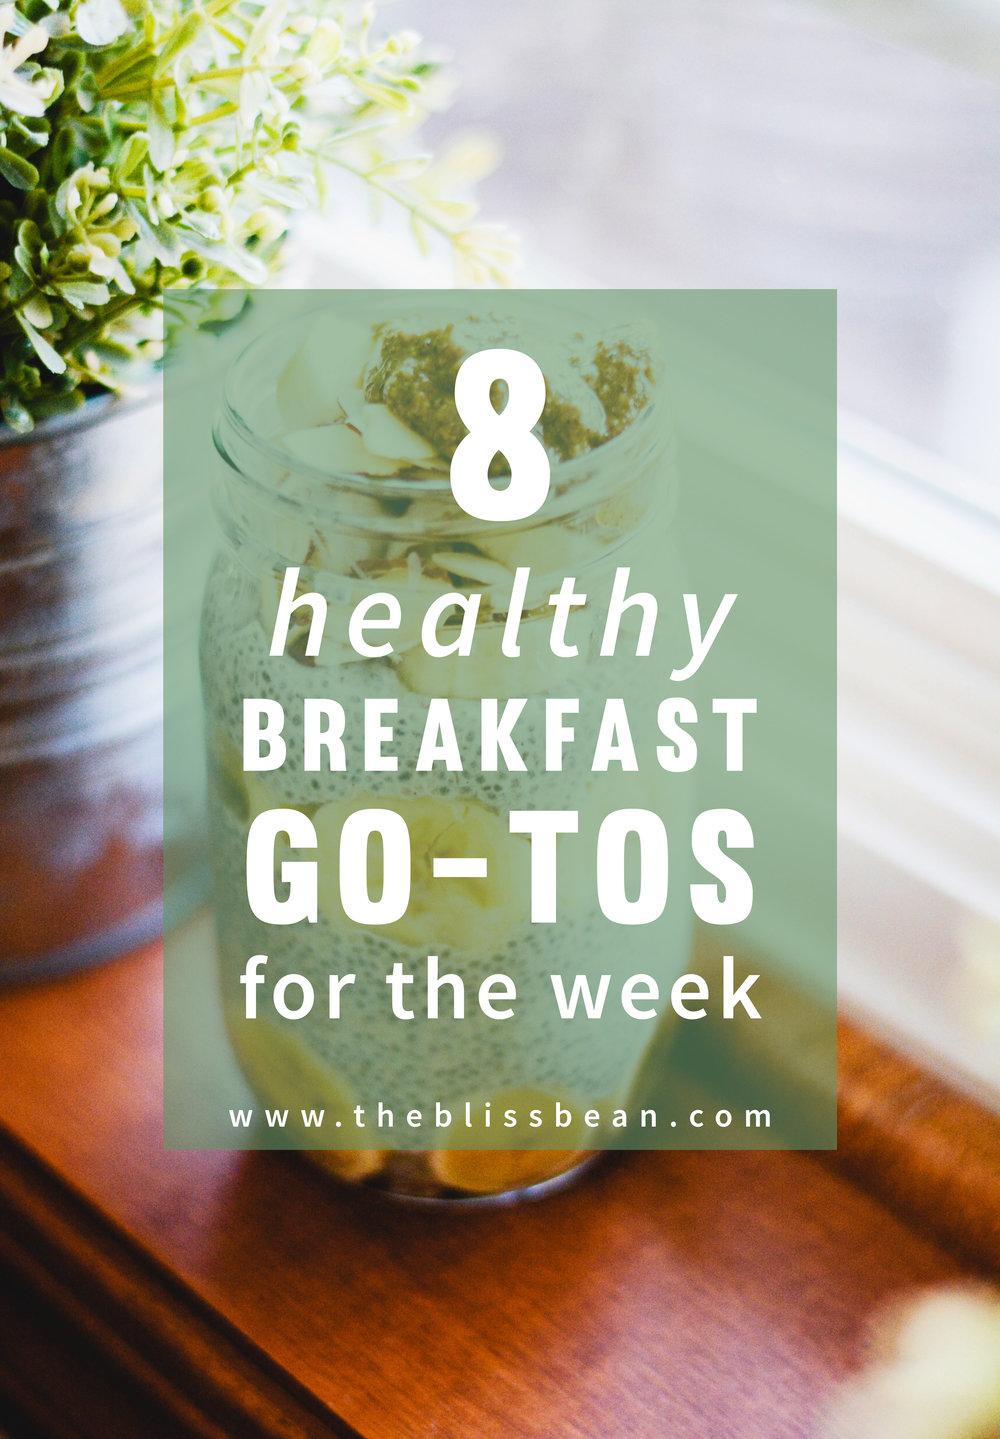 8 Healthy Breakfast Ideas - Cover Photo.jpg